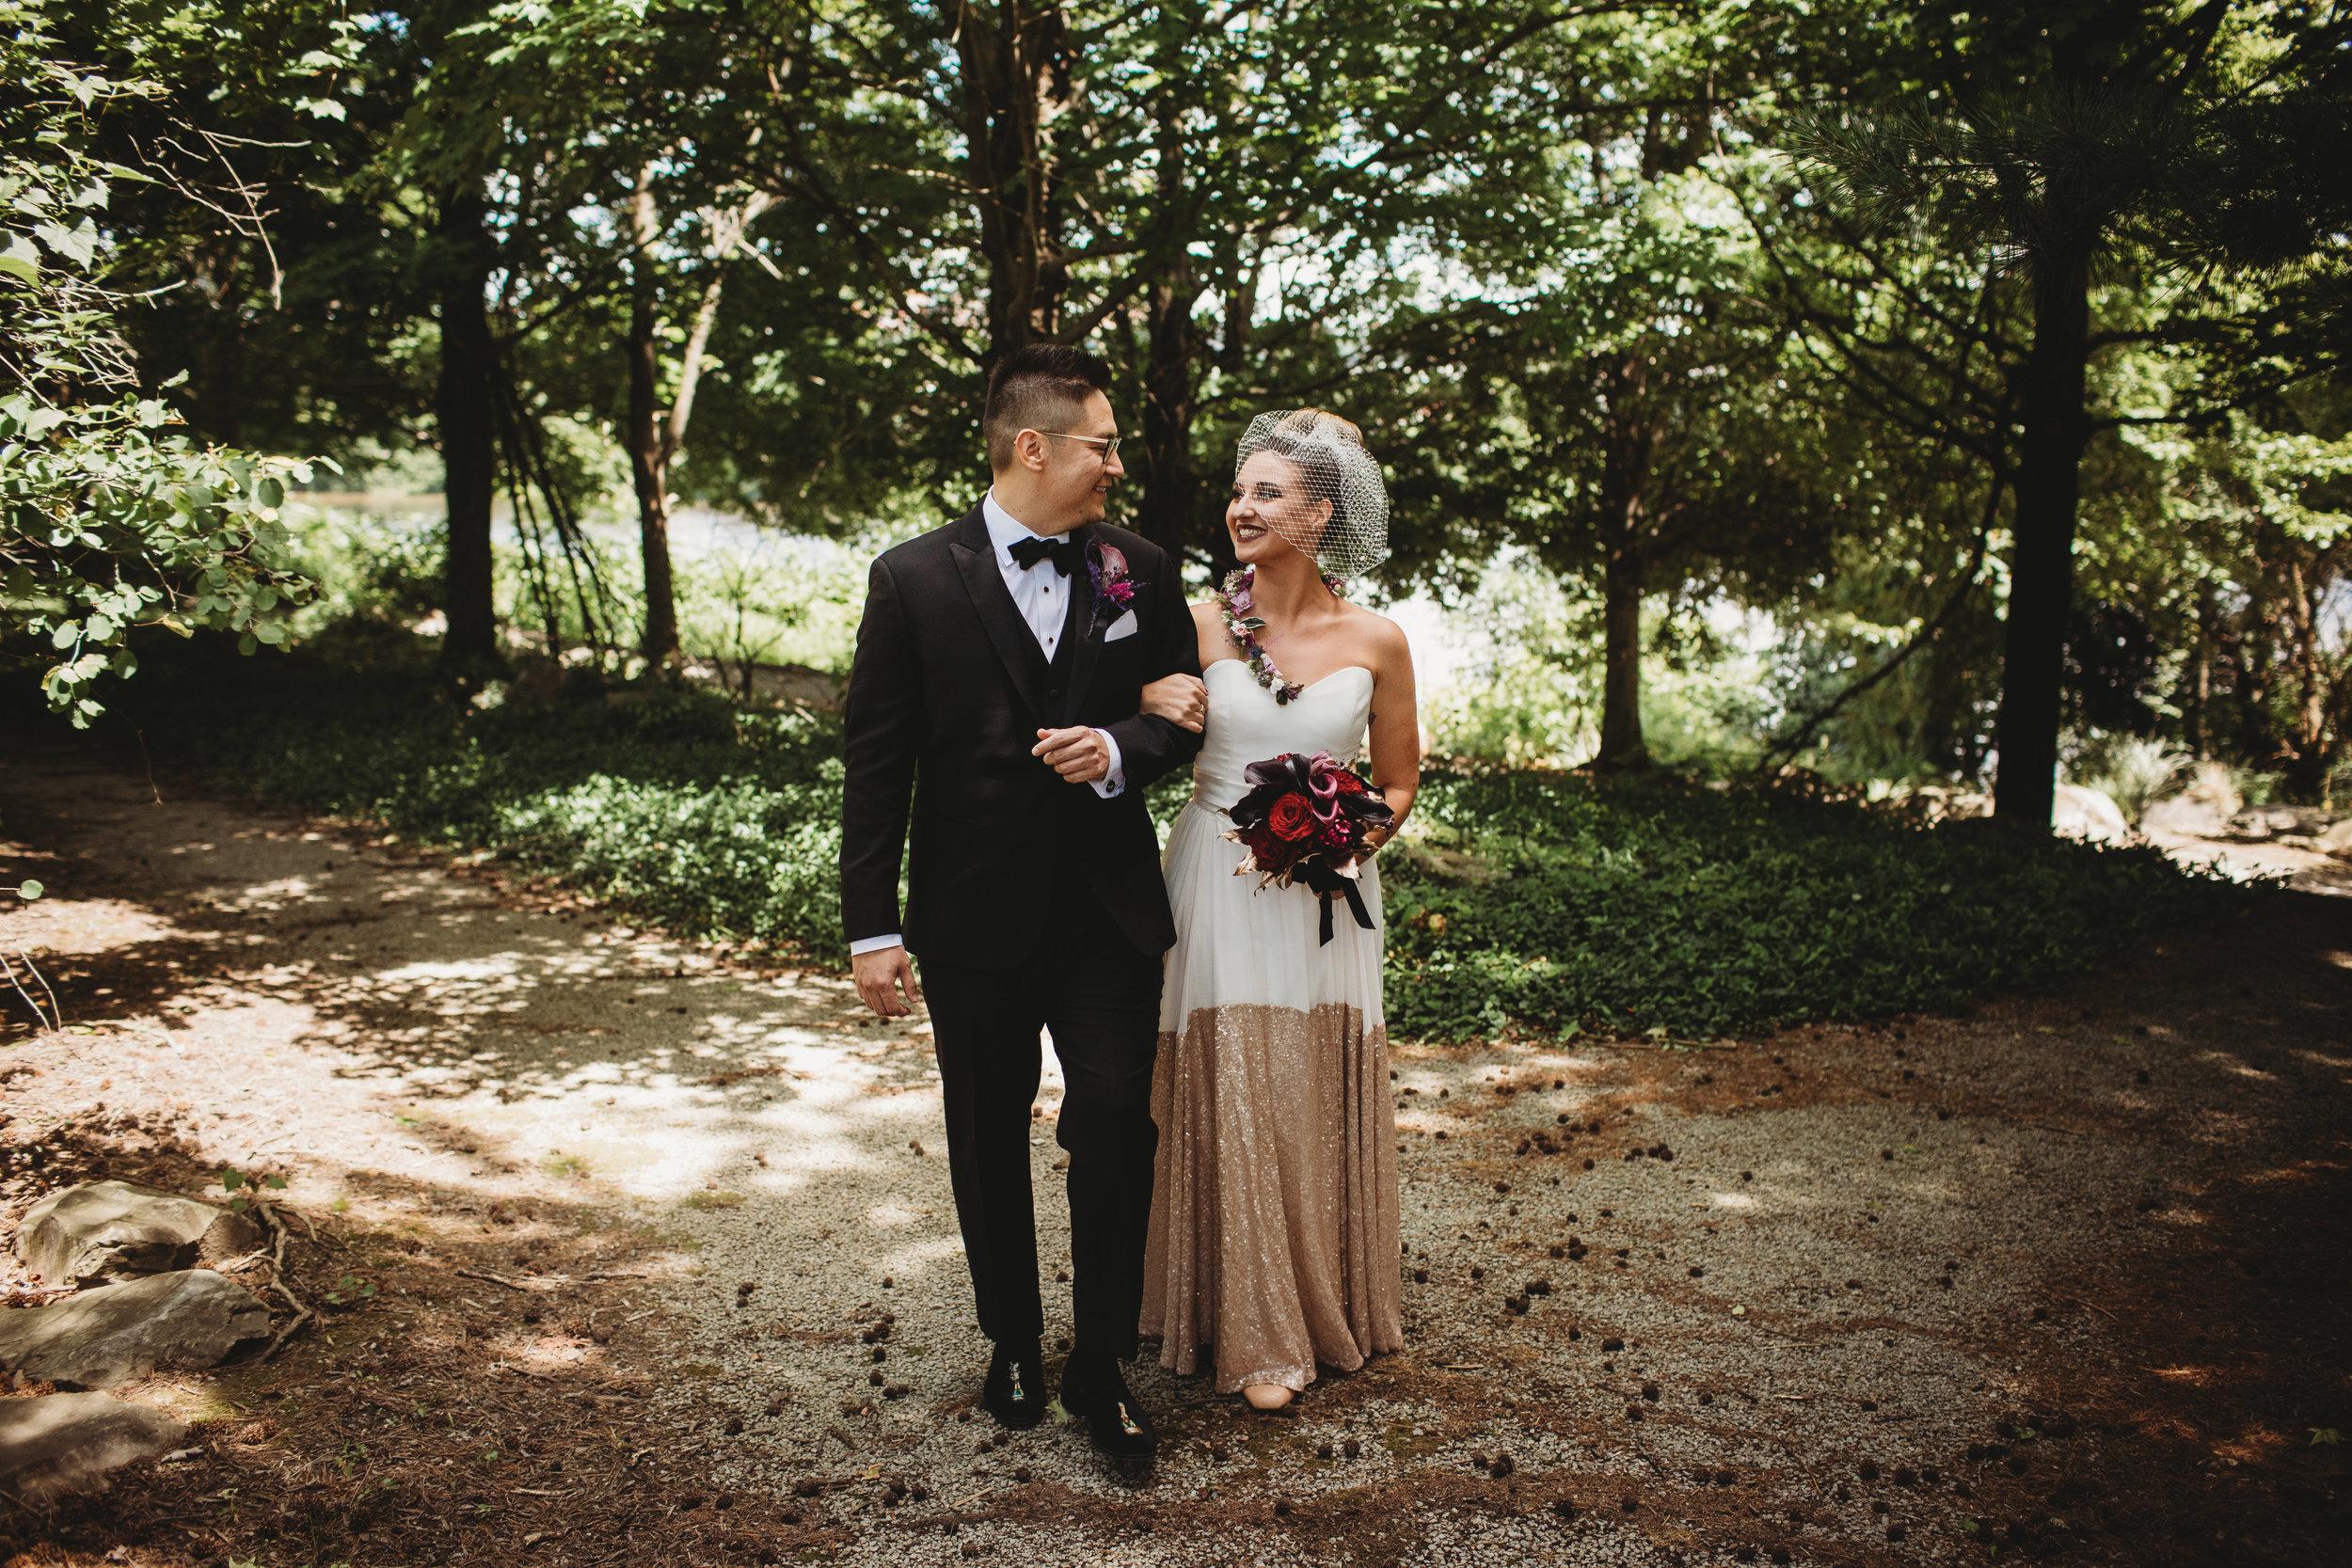 Heather-Andy-Wedding-5318.jpg